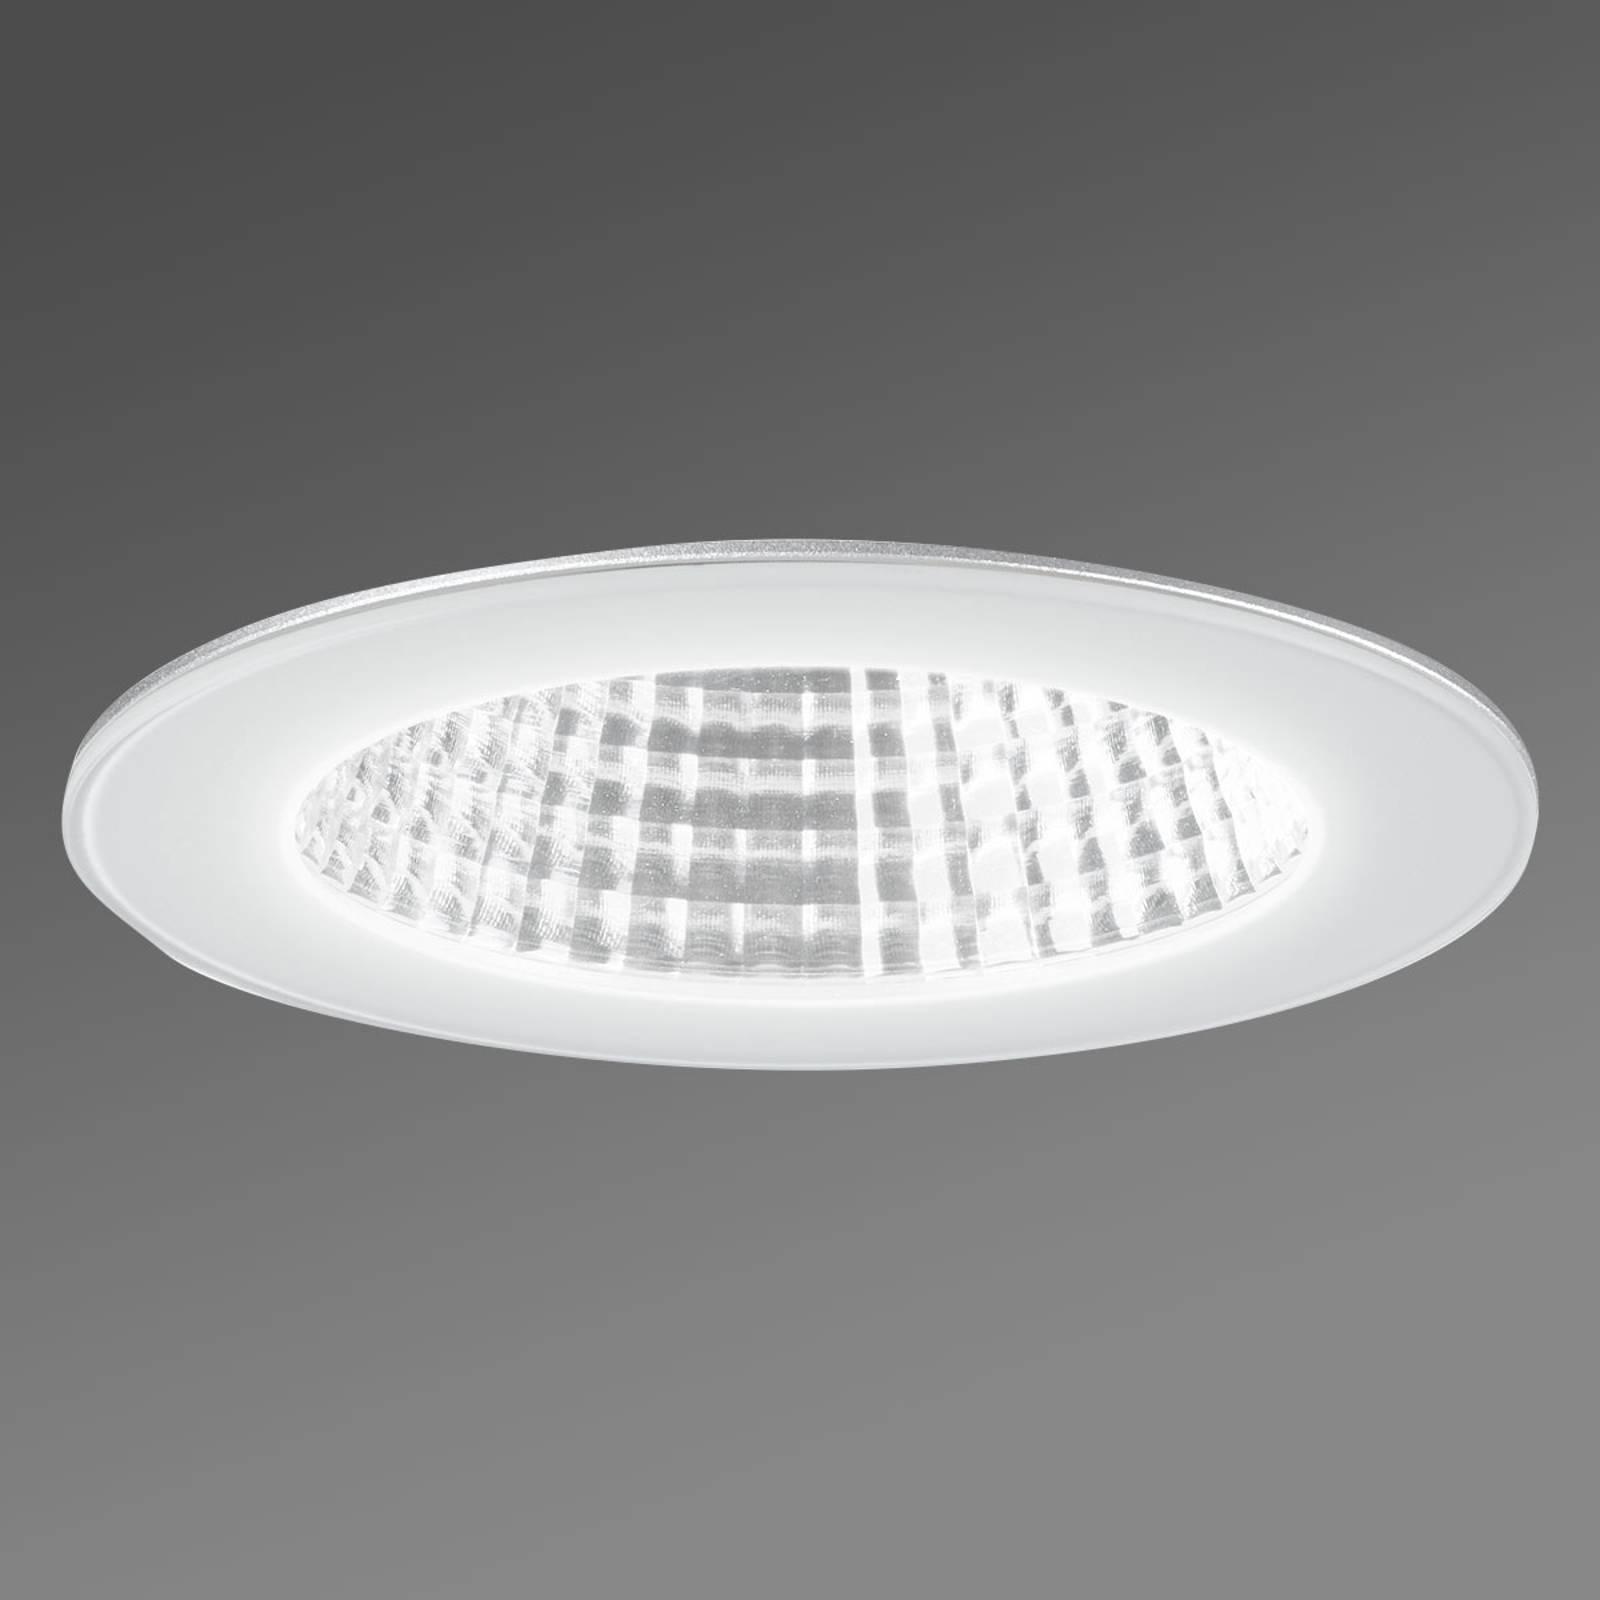 LED inbouwspot IDown 13, spatwaterdicht